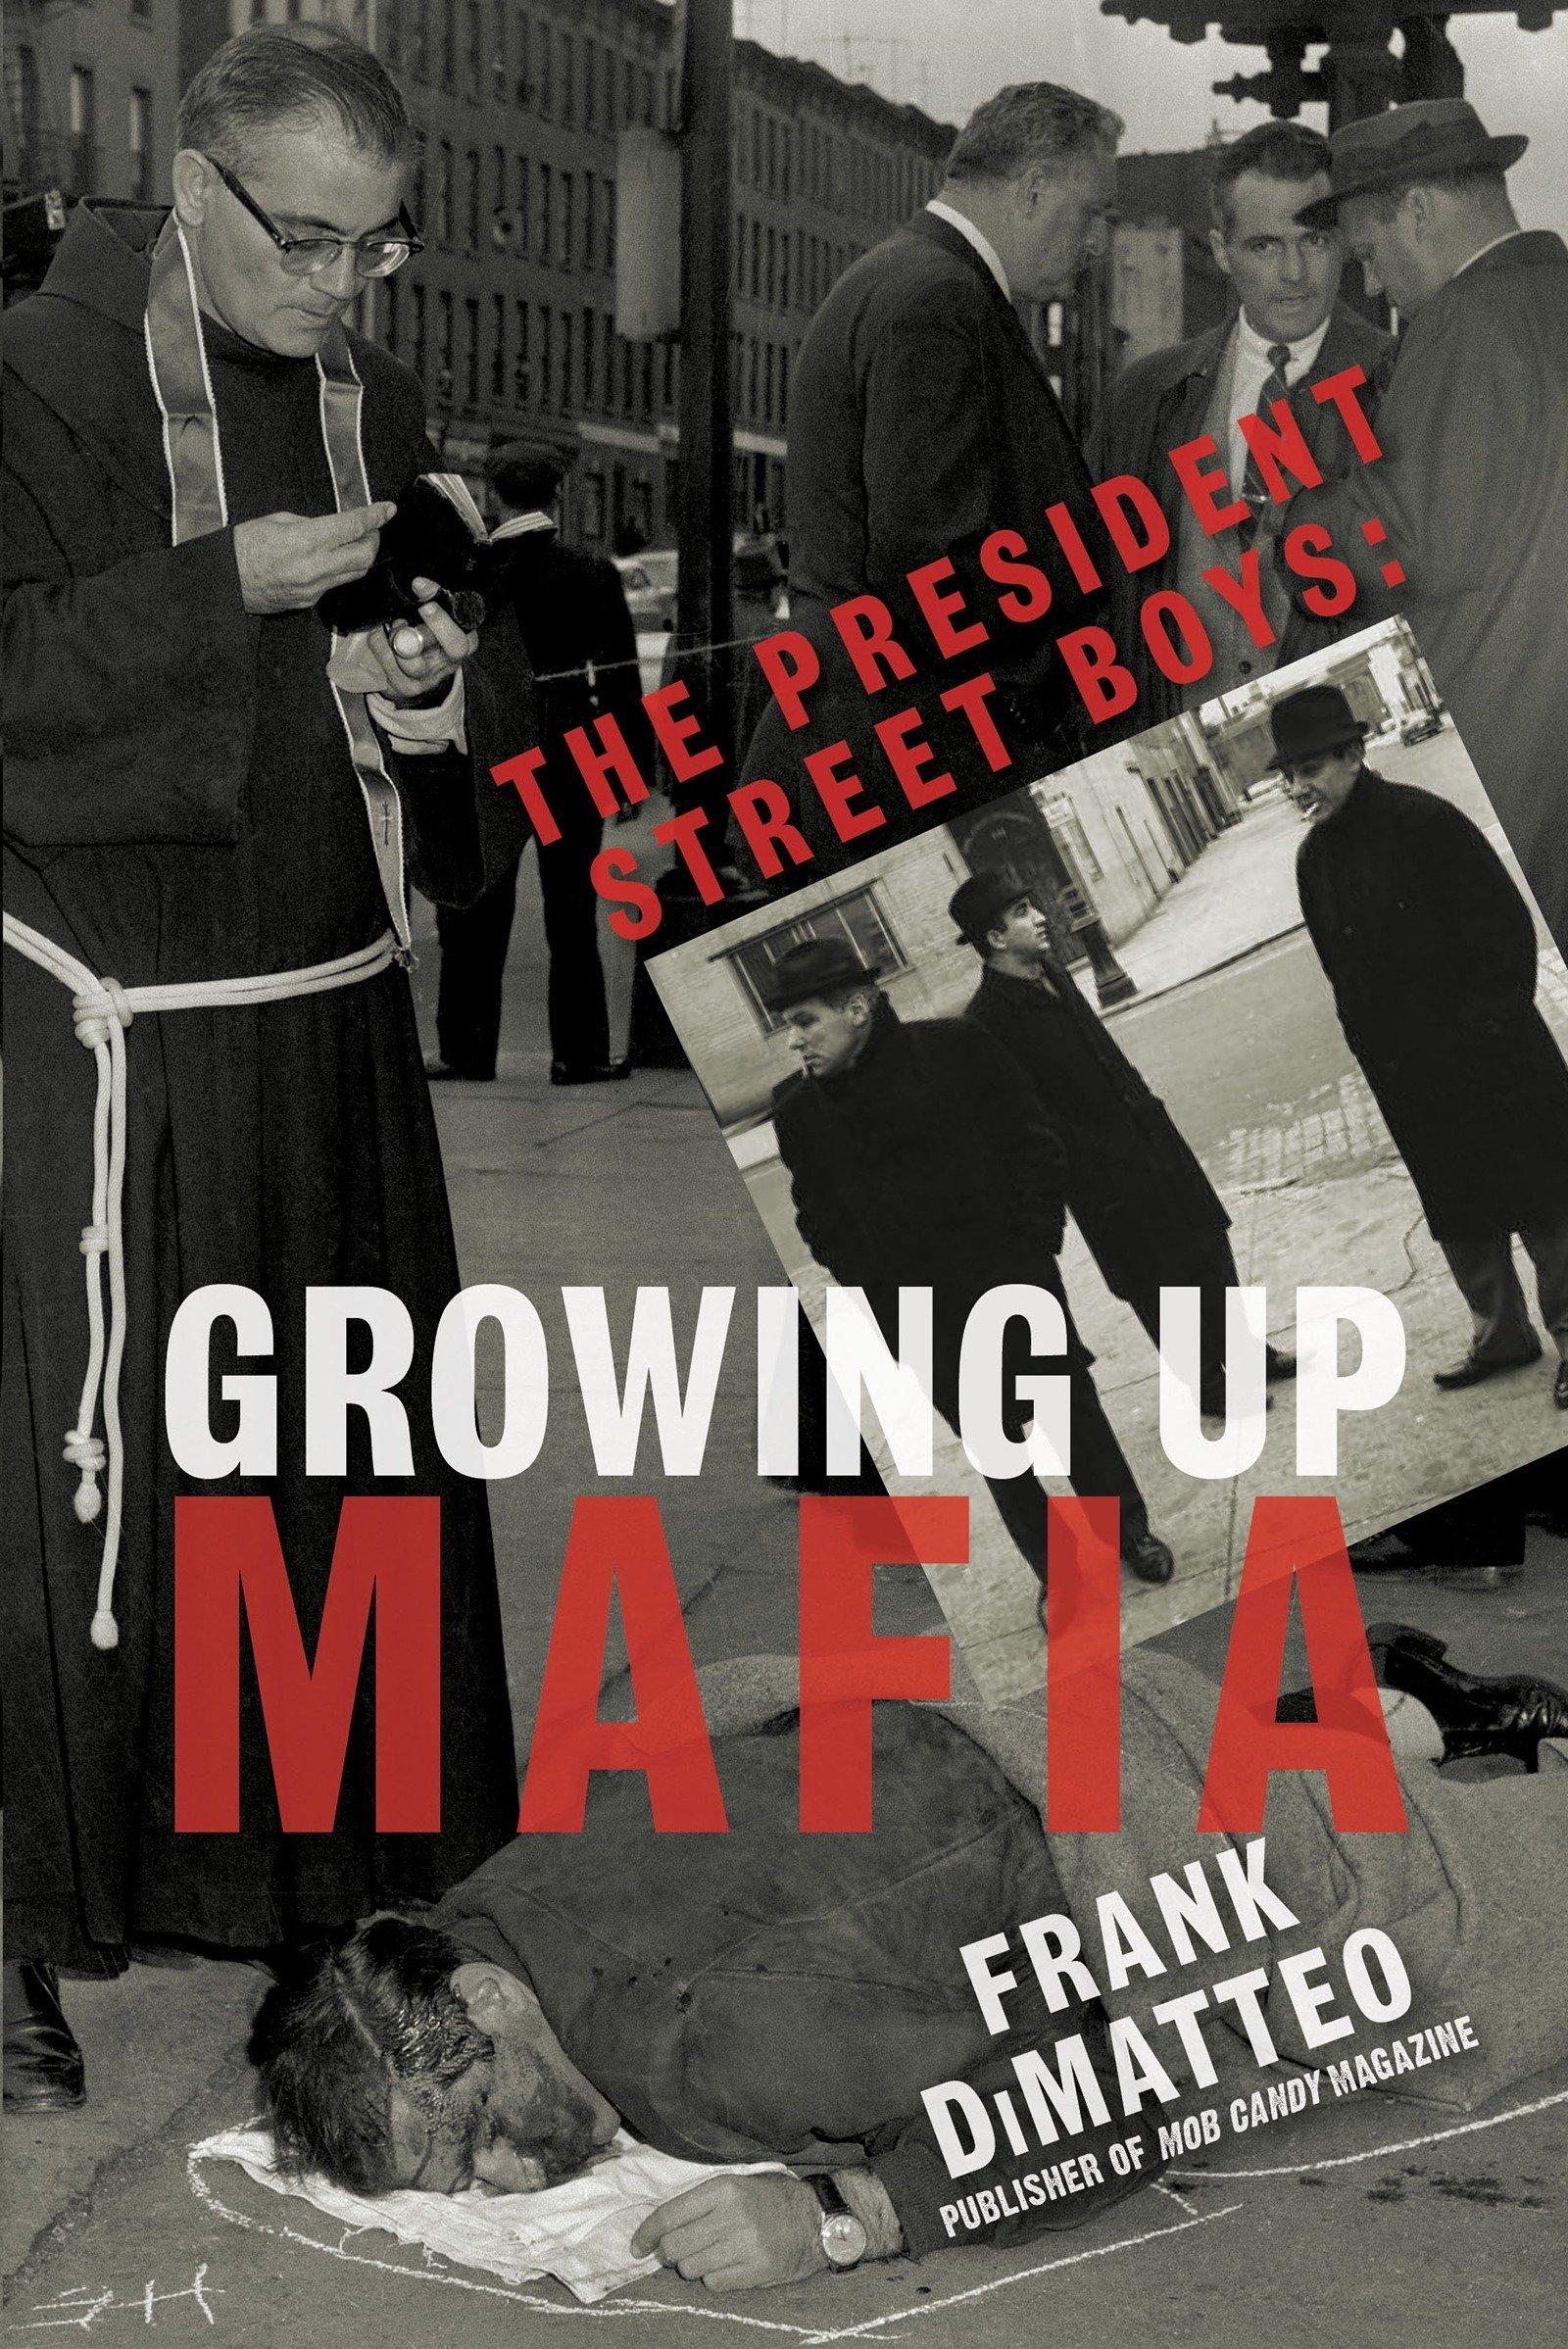 The President Street Boys  Growing Up Mafia